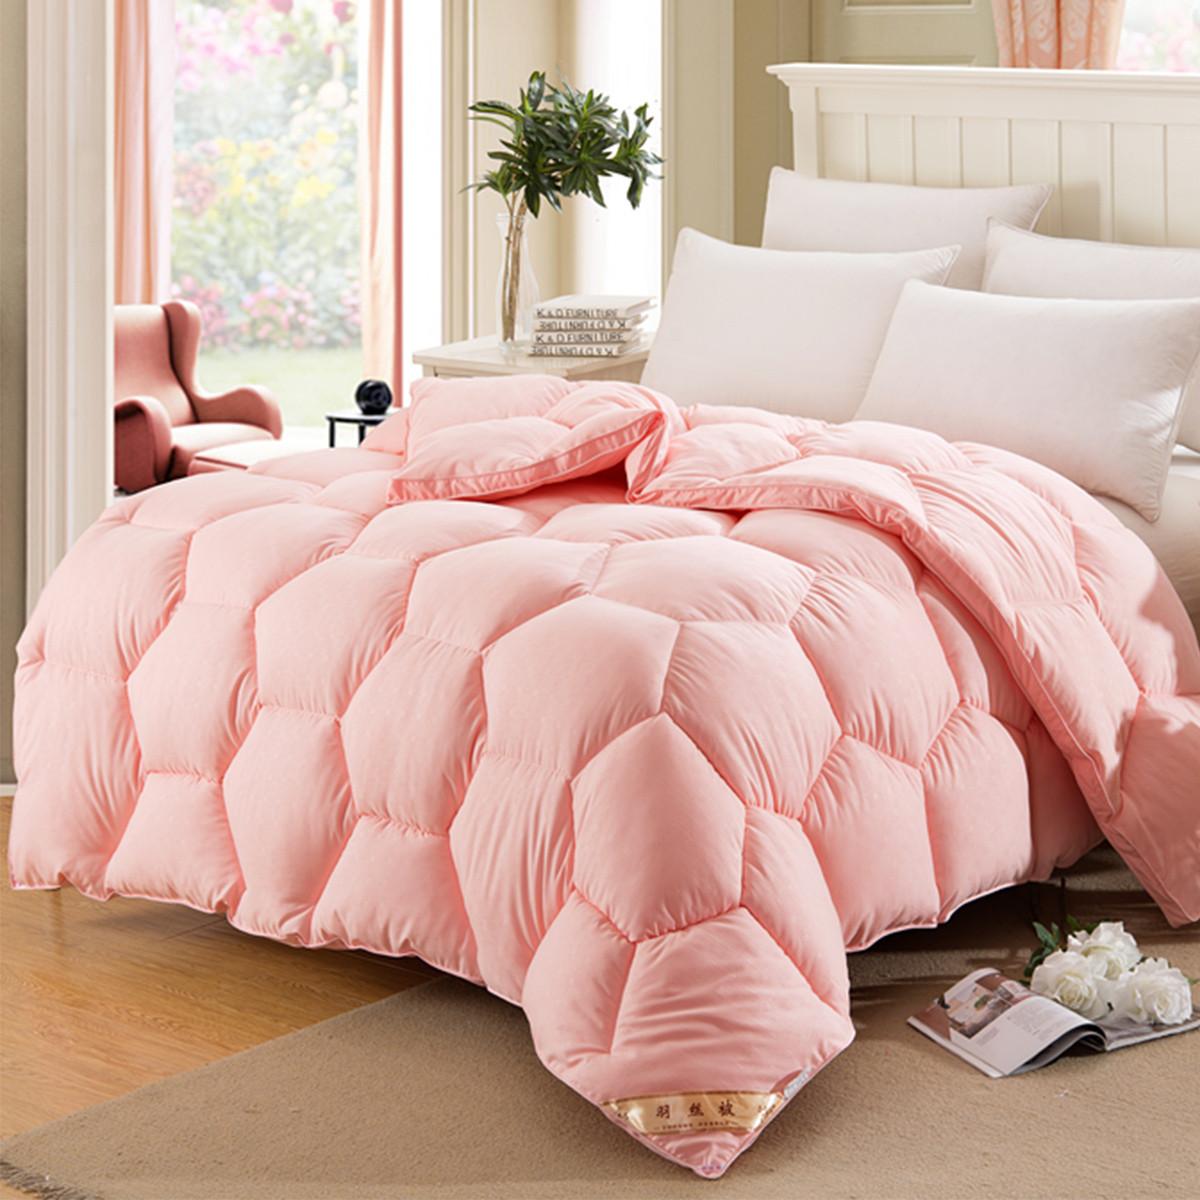 Ramada【年底清仓】柔系列羽丝绒保暖被芯盖被床上空调被被子被芯COLOR玉色